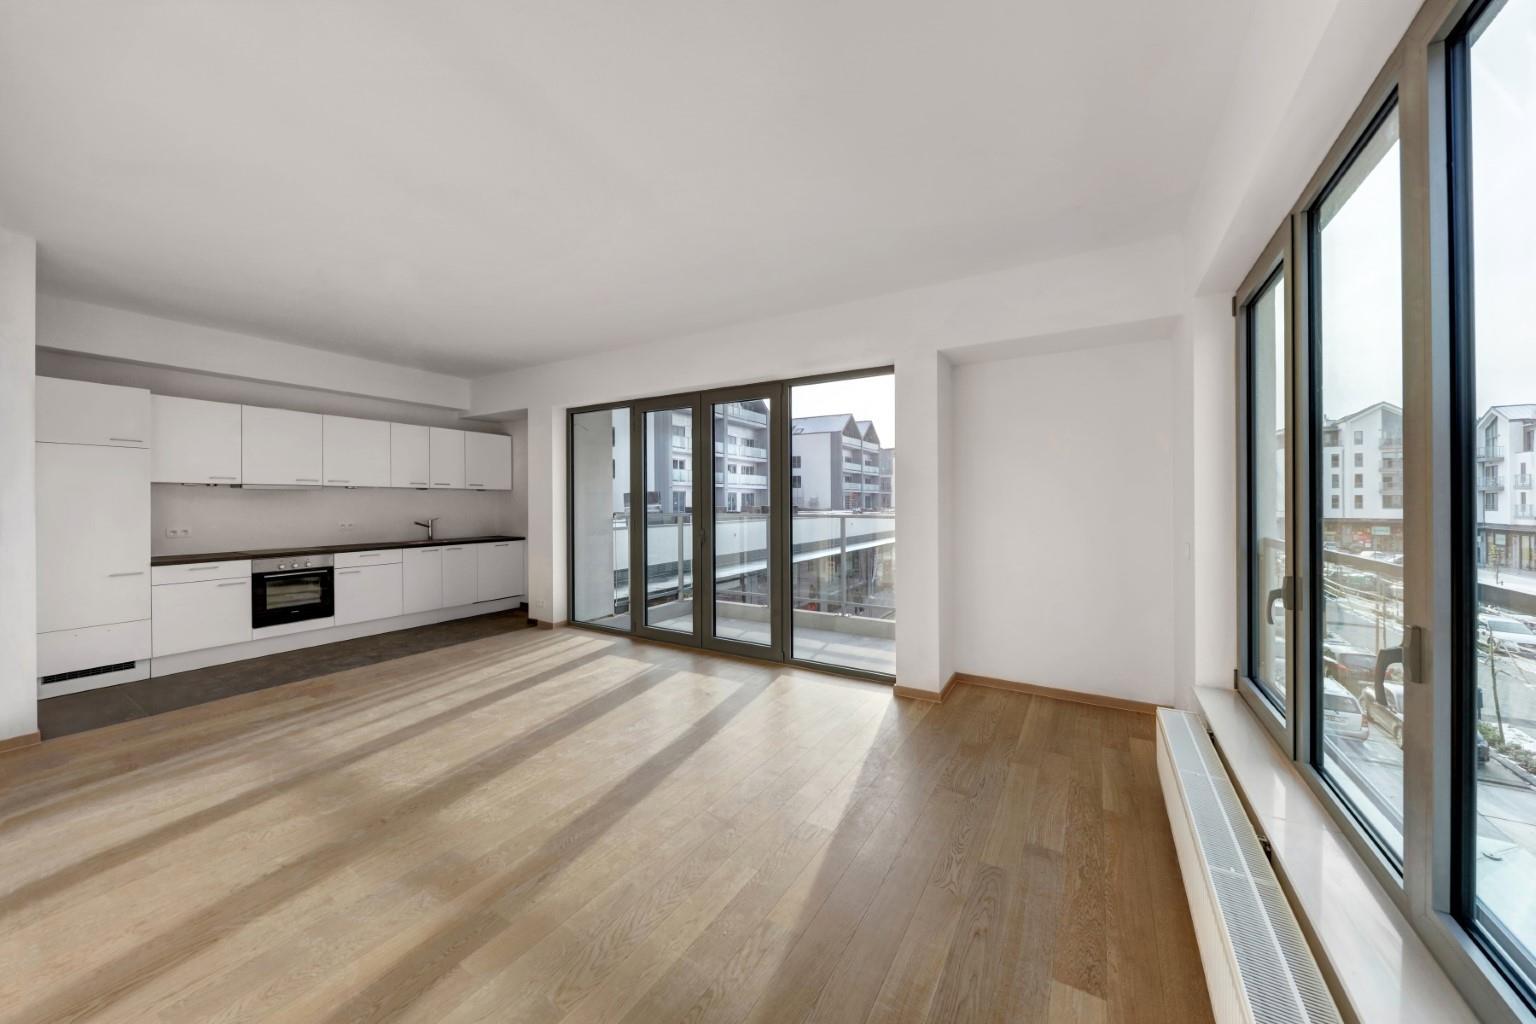 Appartement - Genval - #3806170-8